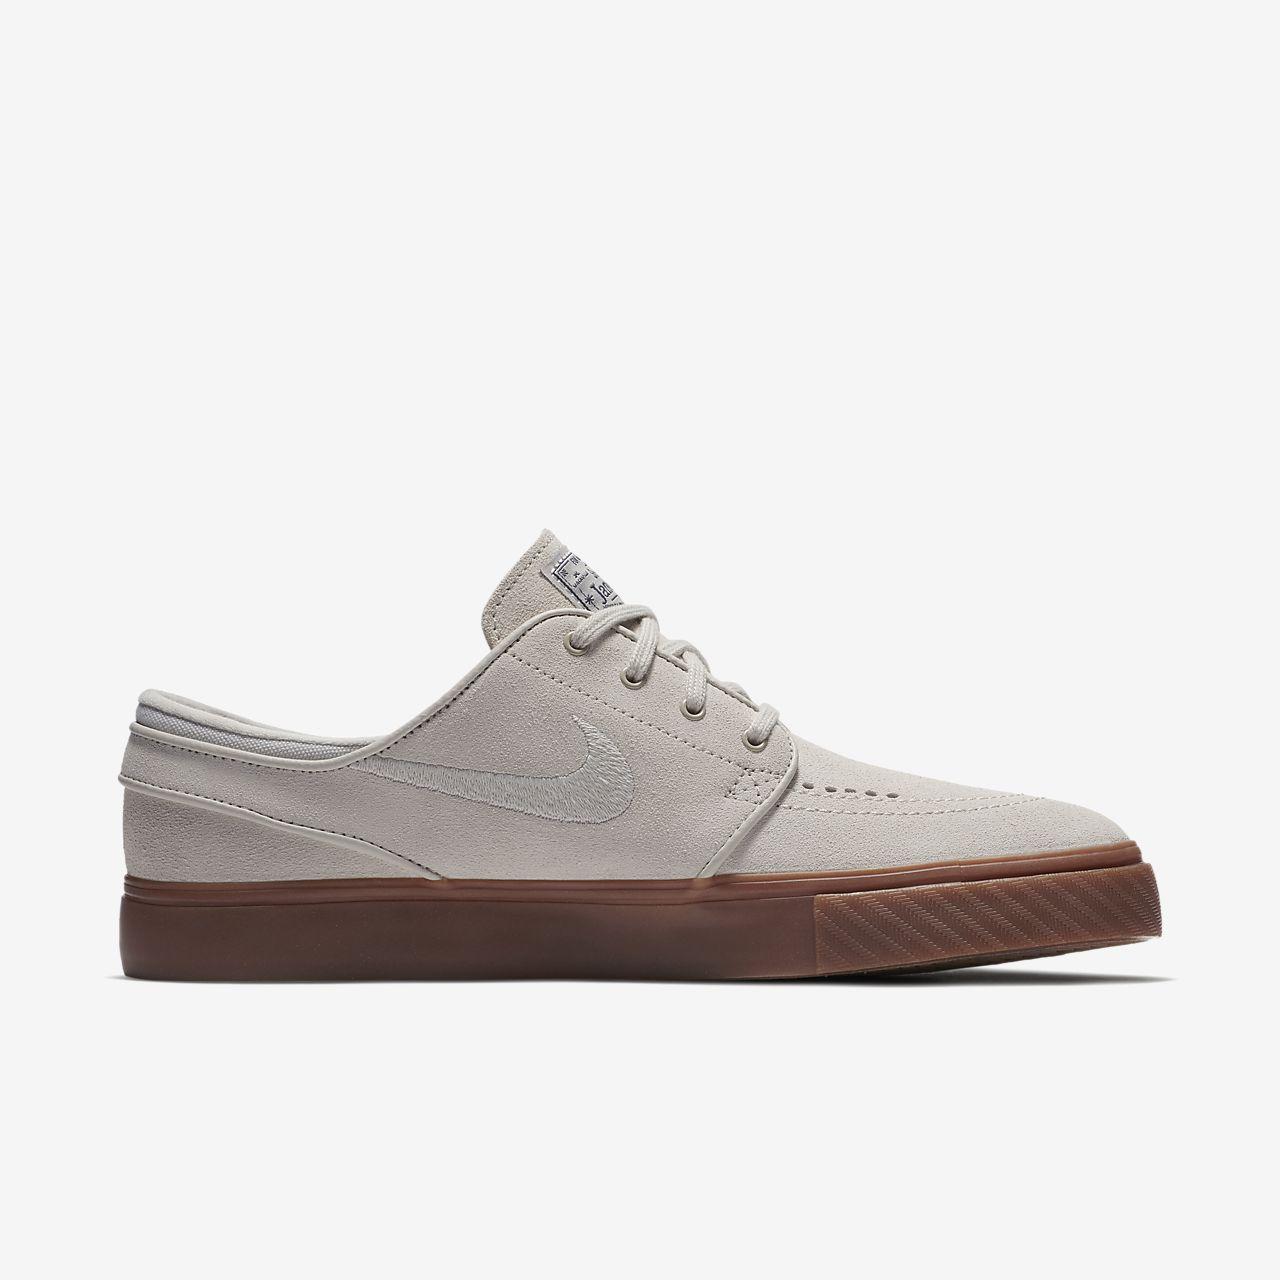 Nike SB Zoom Stefan Janoski Skateboard Shoes for Men